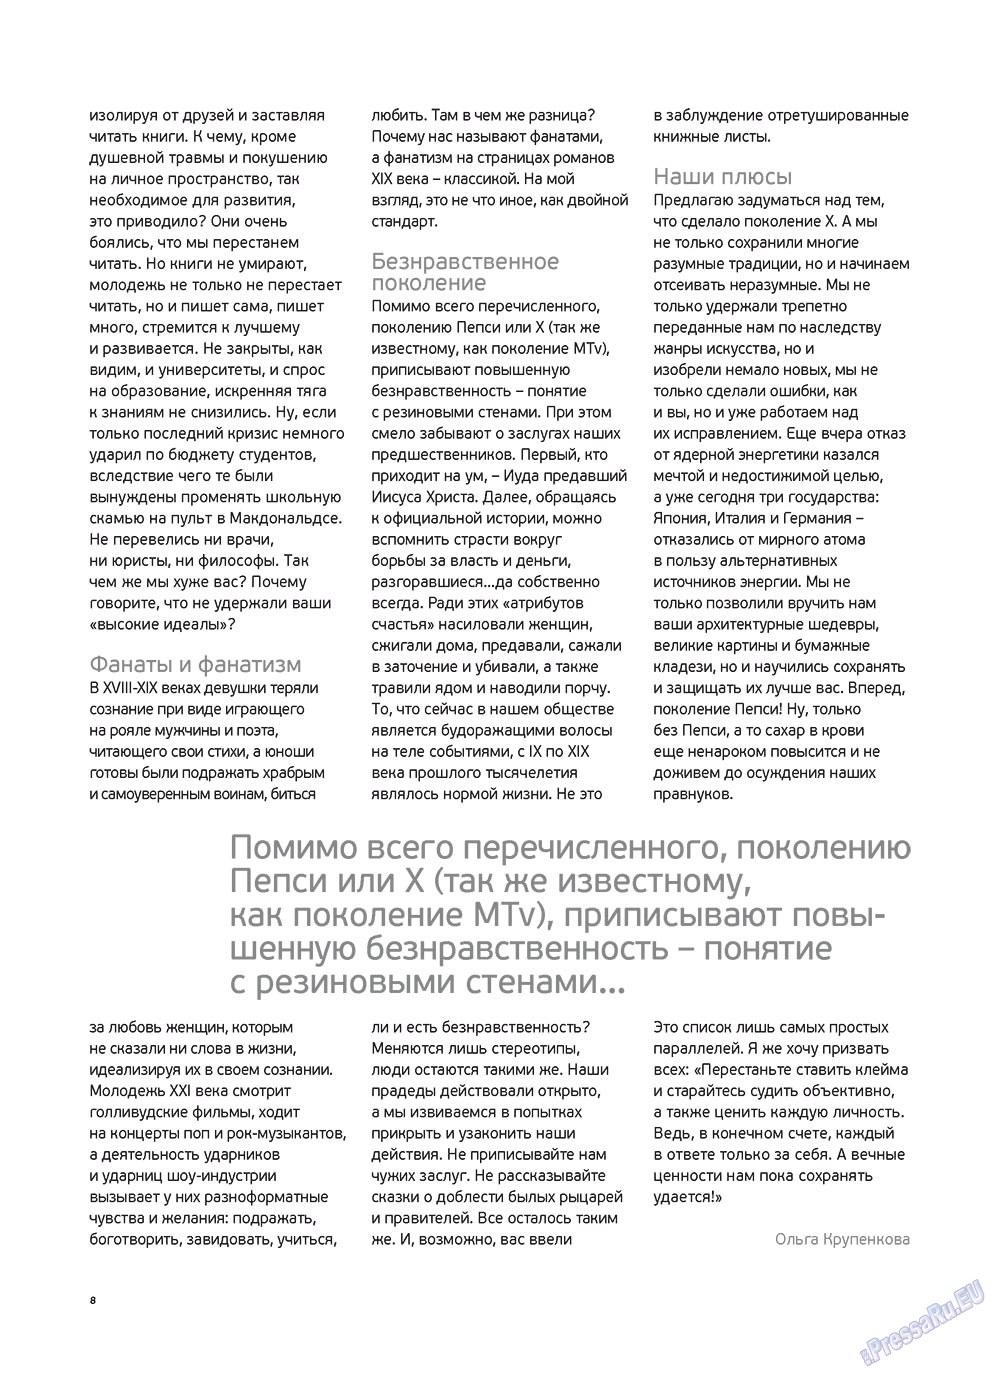 Артек (журнал). 2011 год, номер 3, стр. 10